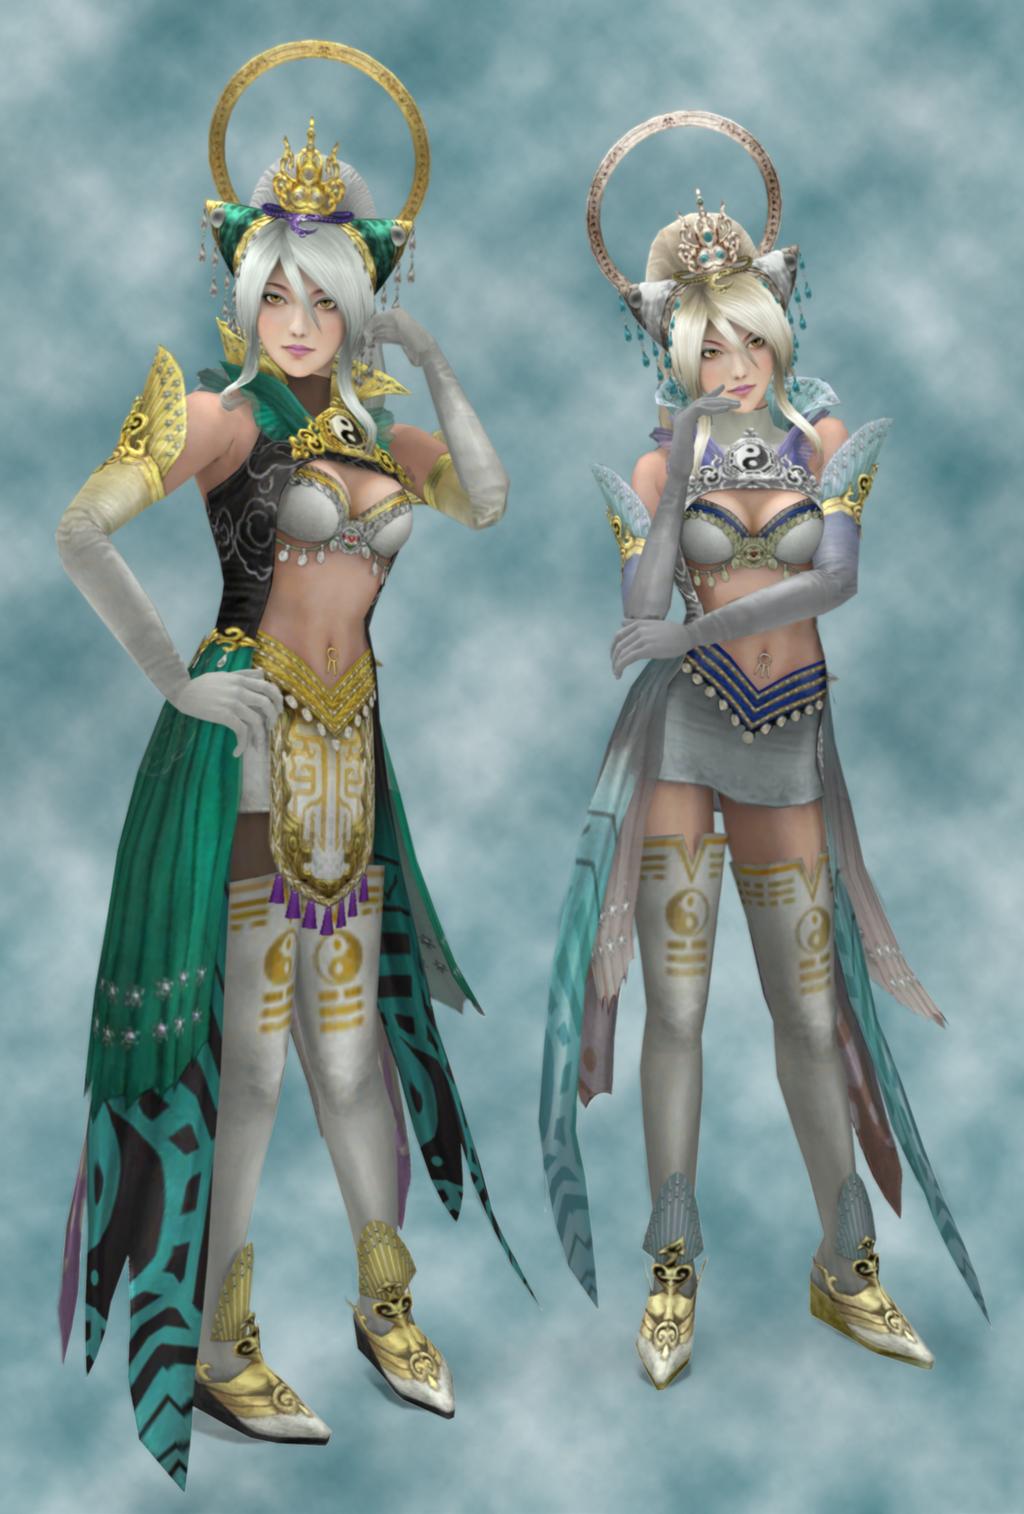 Dynasty warriors sex pic hentia scene